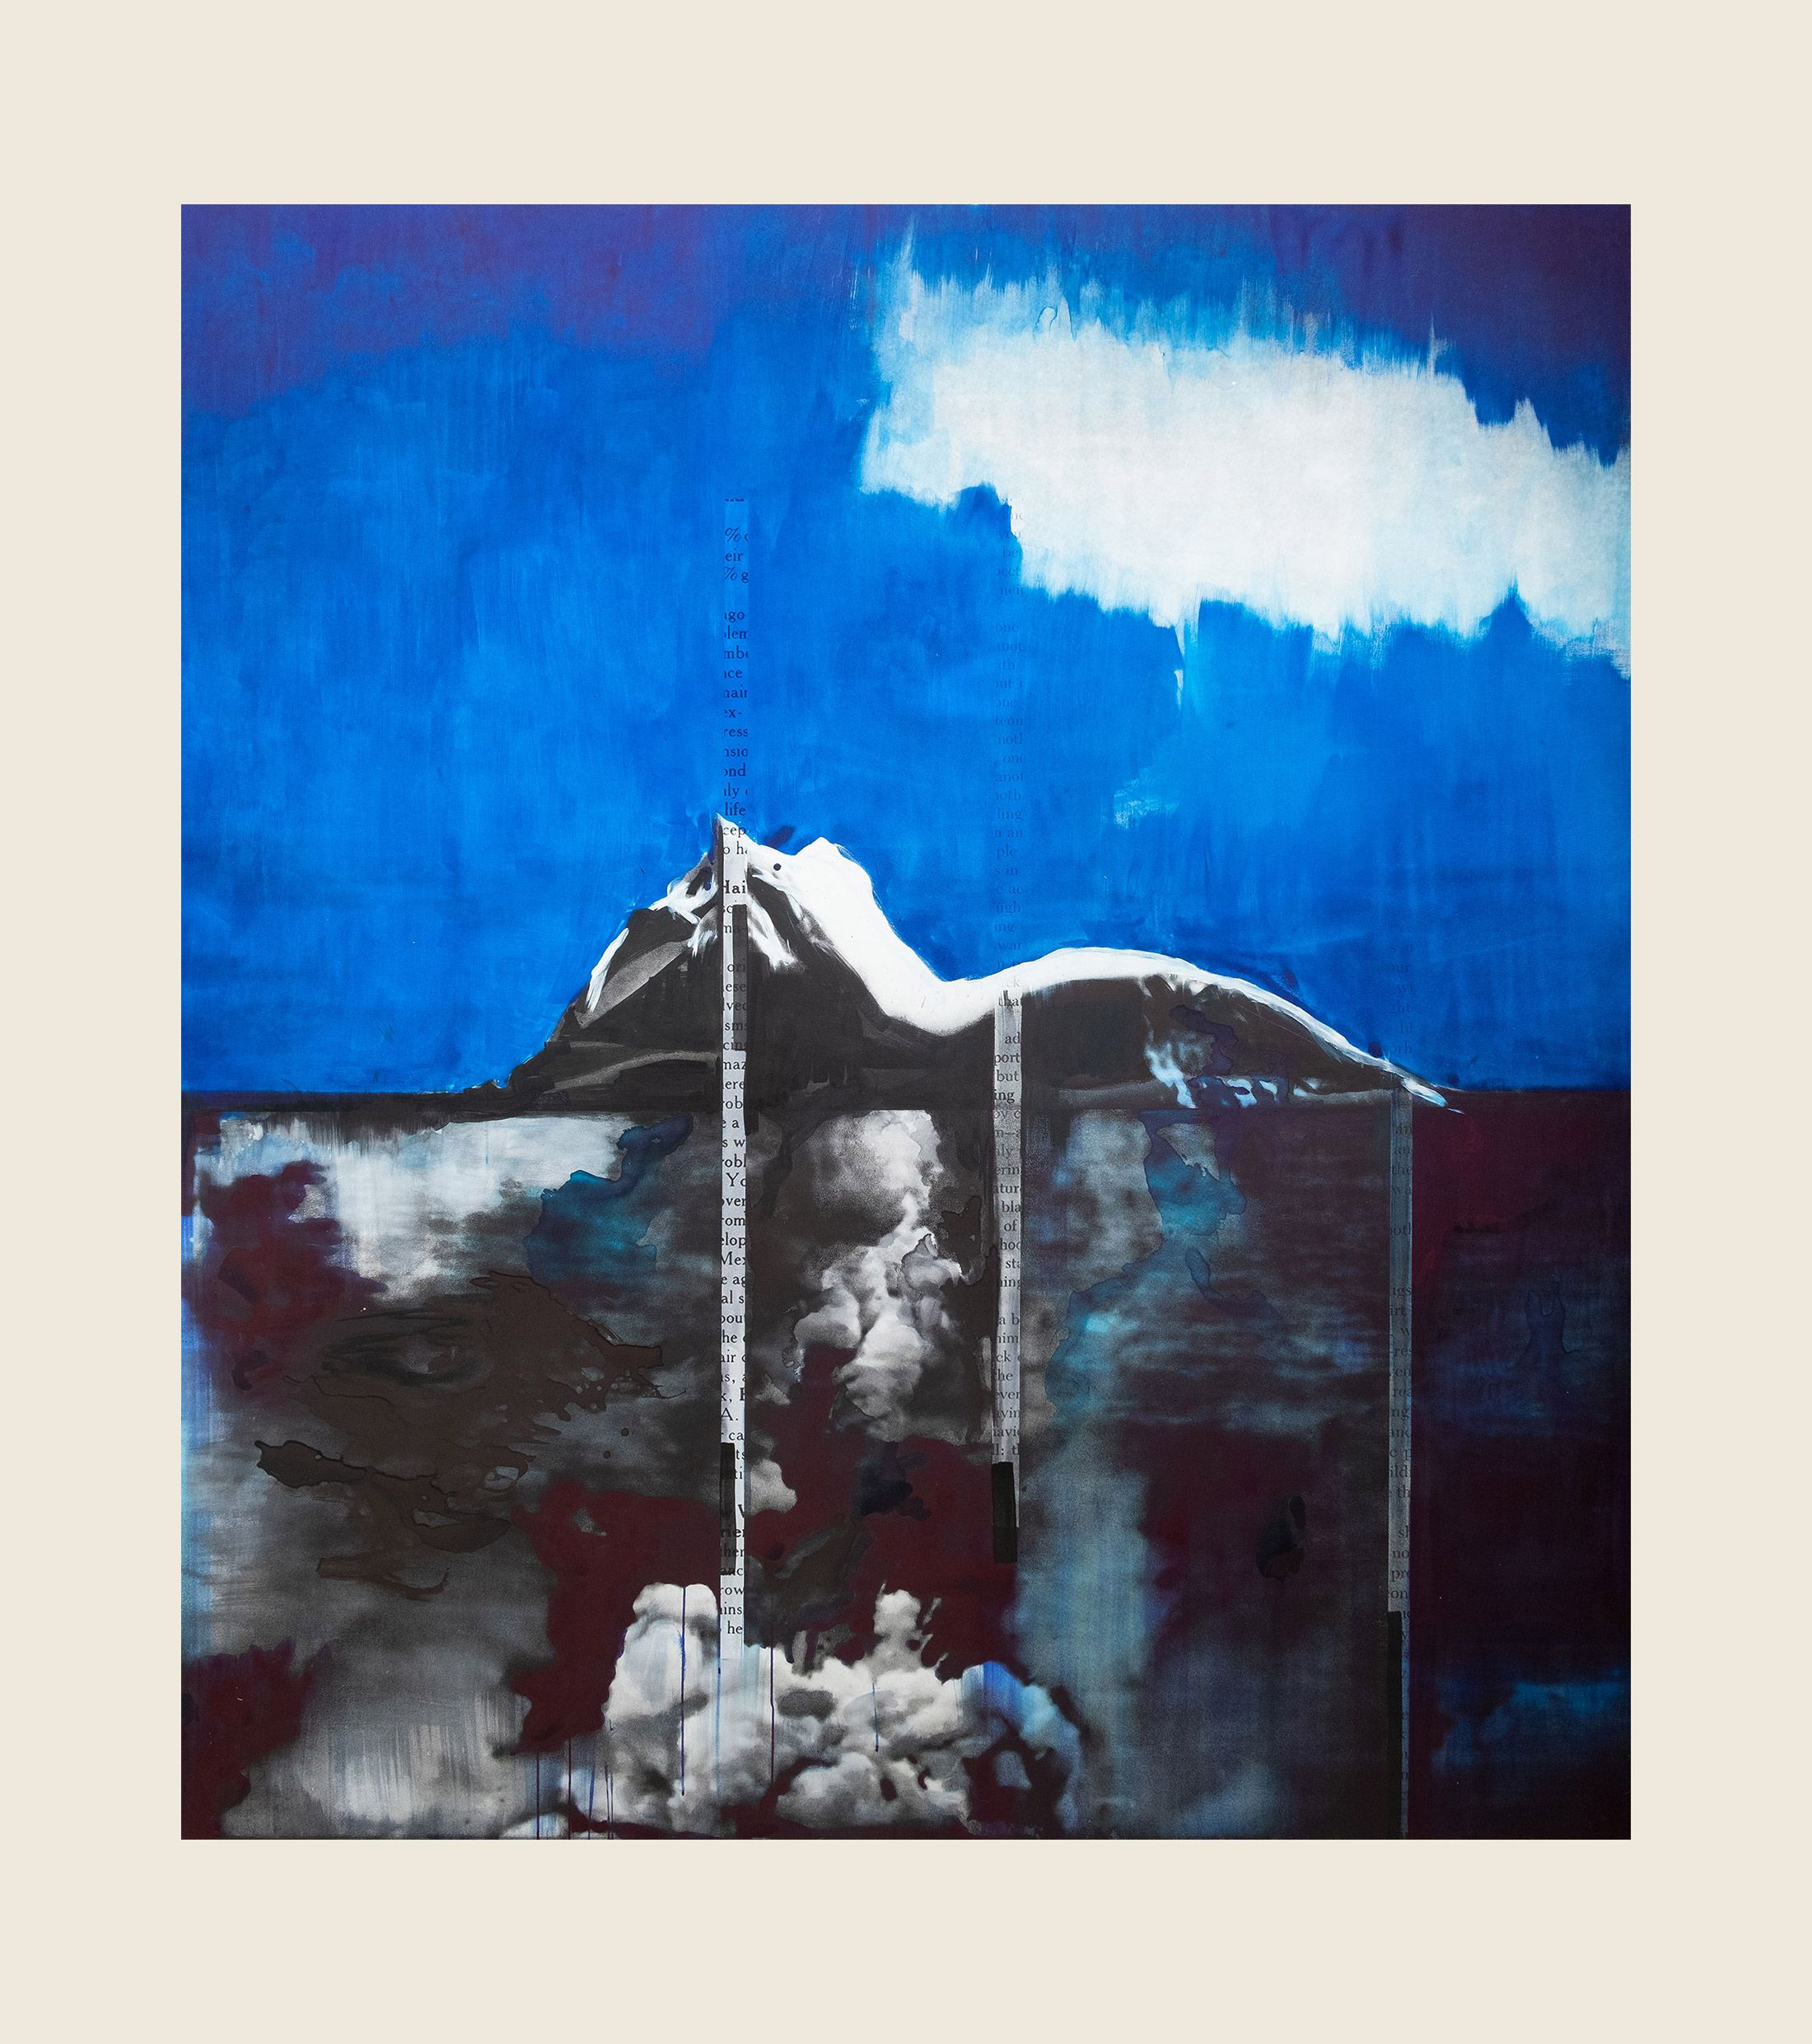 Blue Earth/Sky, 2018